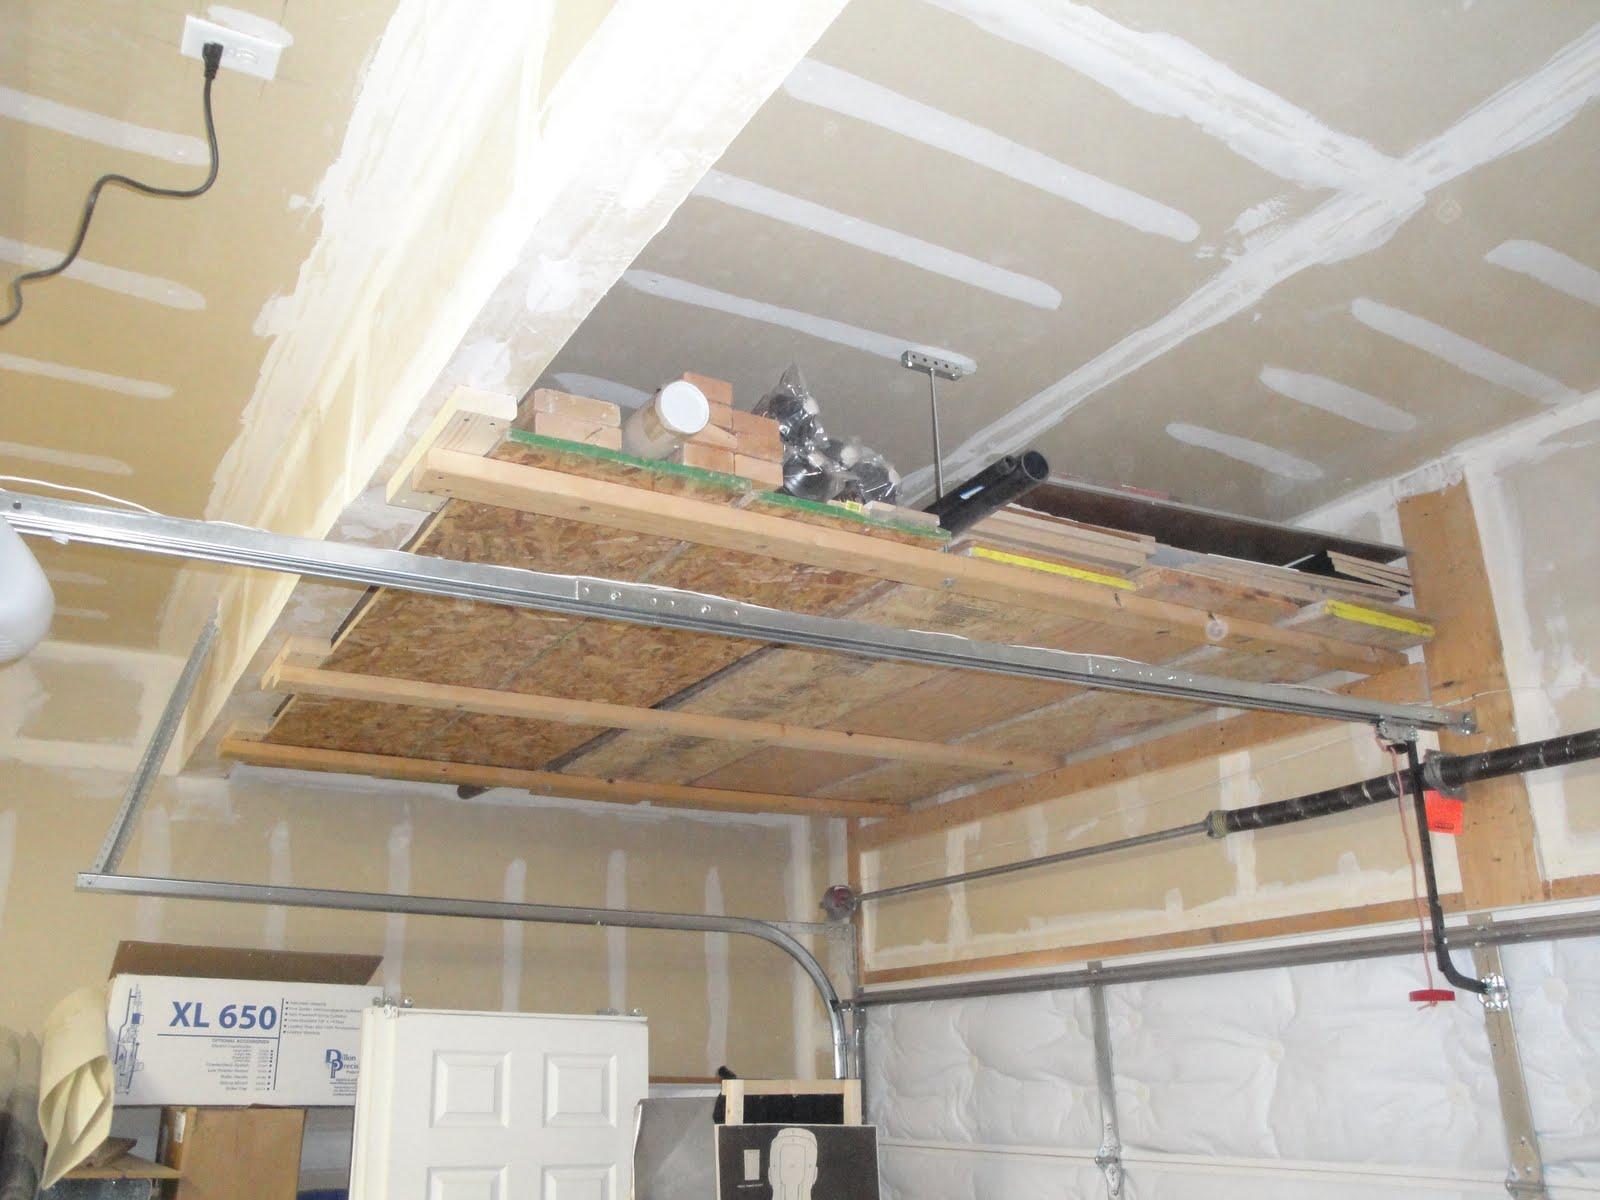 geek kraft new lathe and more garage space. Black Bedroom Furniture Sets. Home Design Ideas